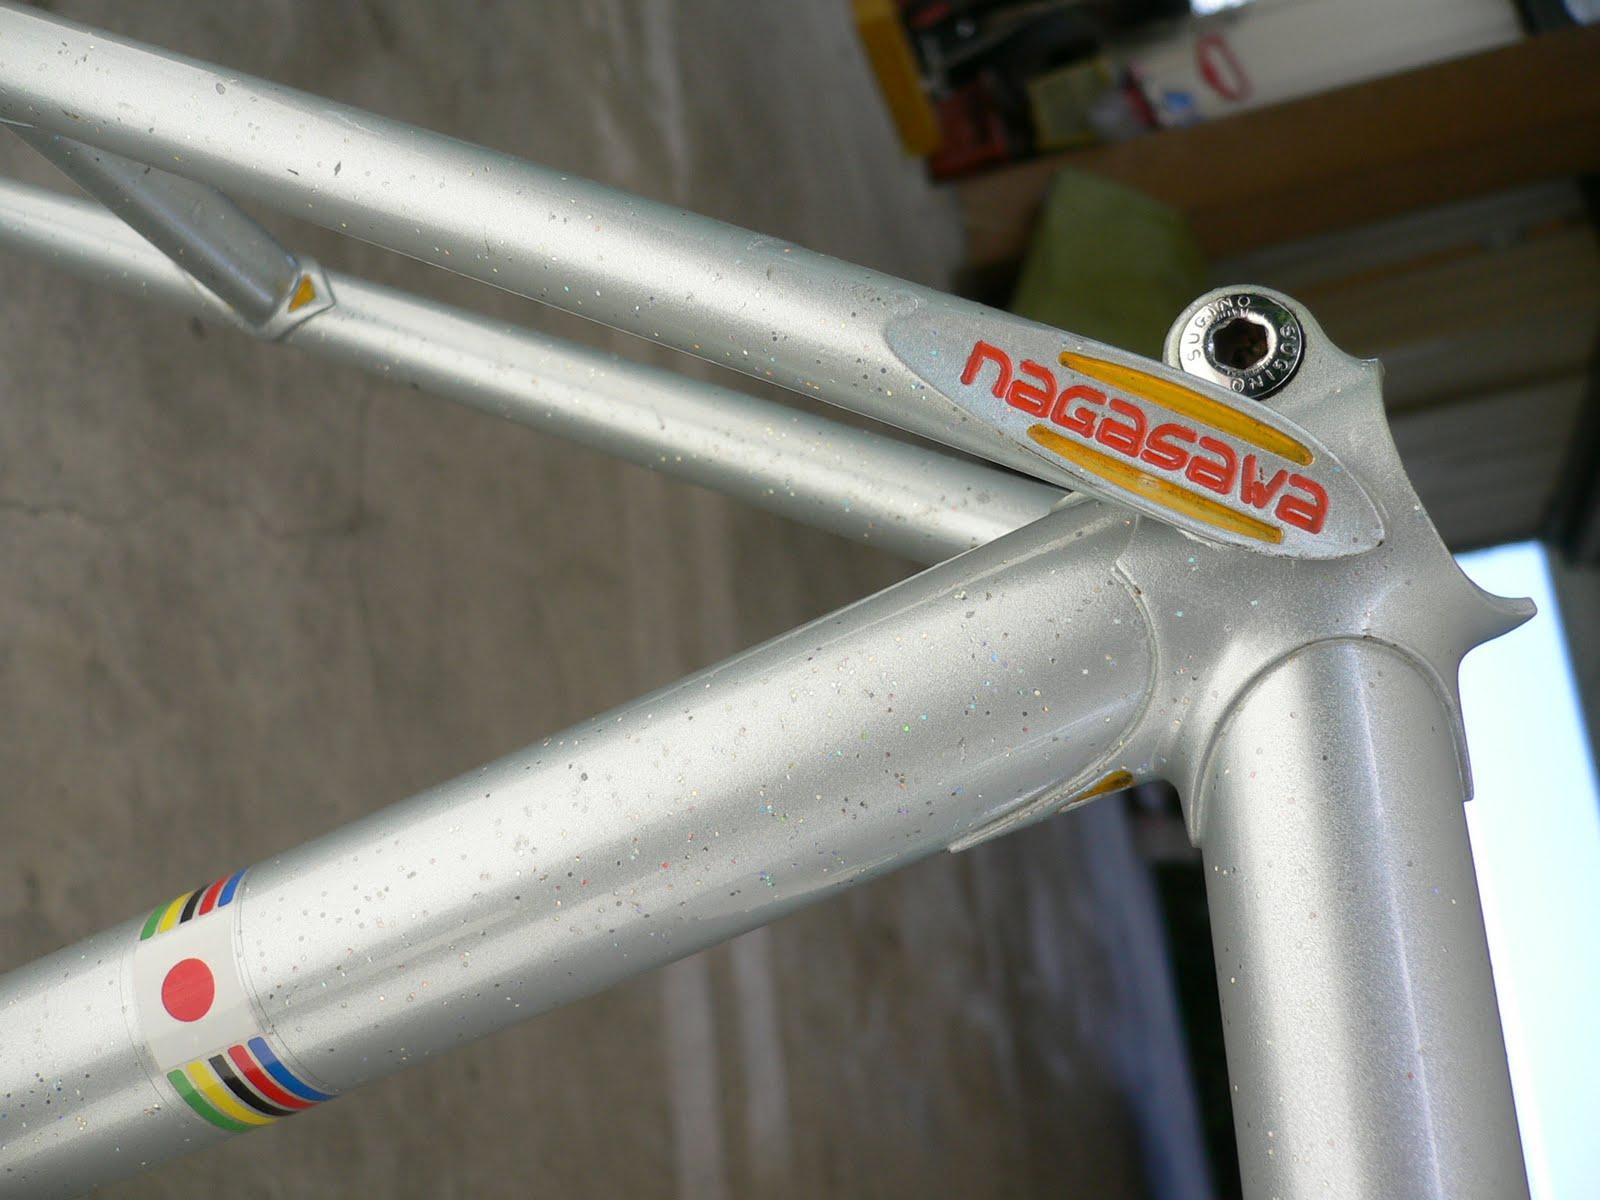 njs keirin track bike &frame for sell: NAGASAWA keirin track frame ...